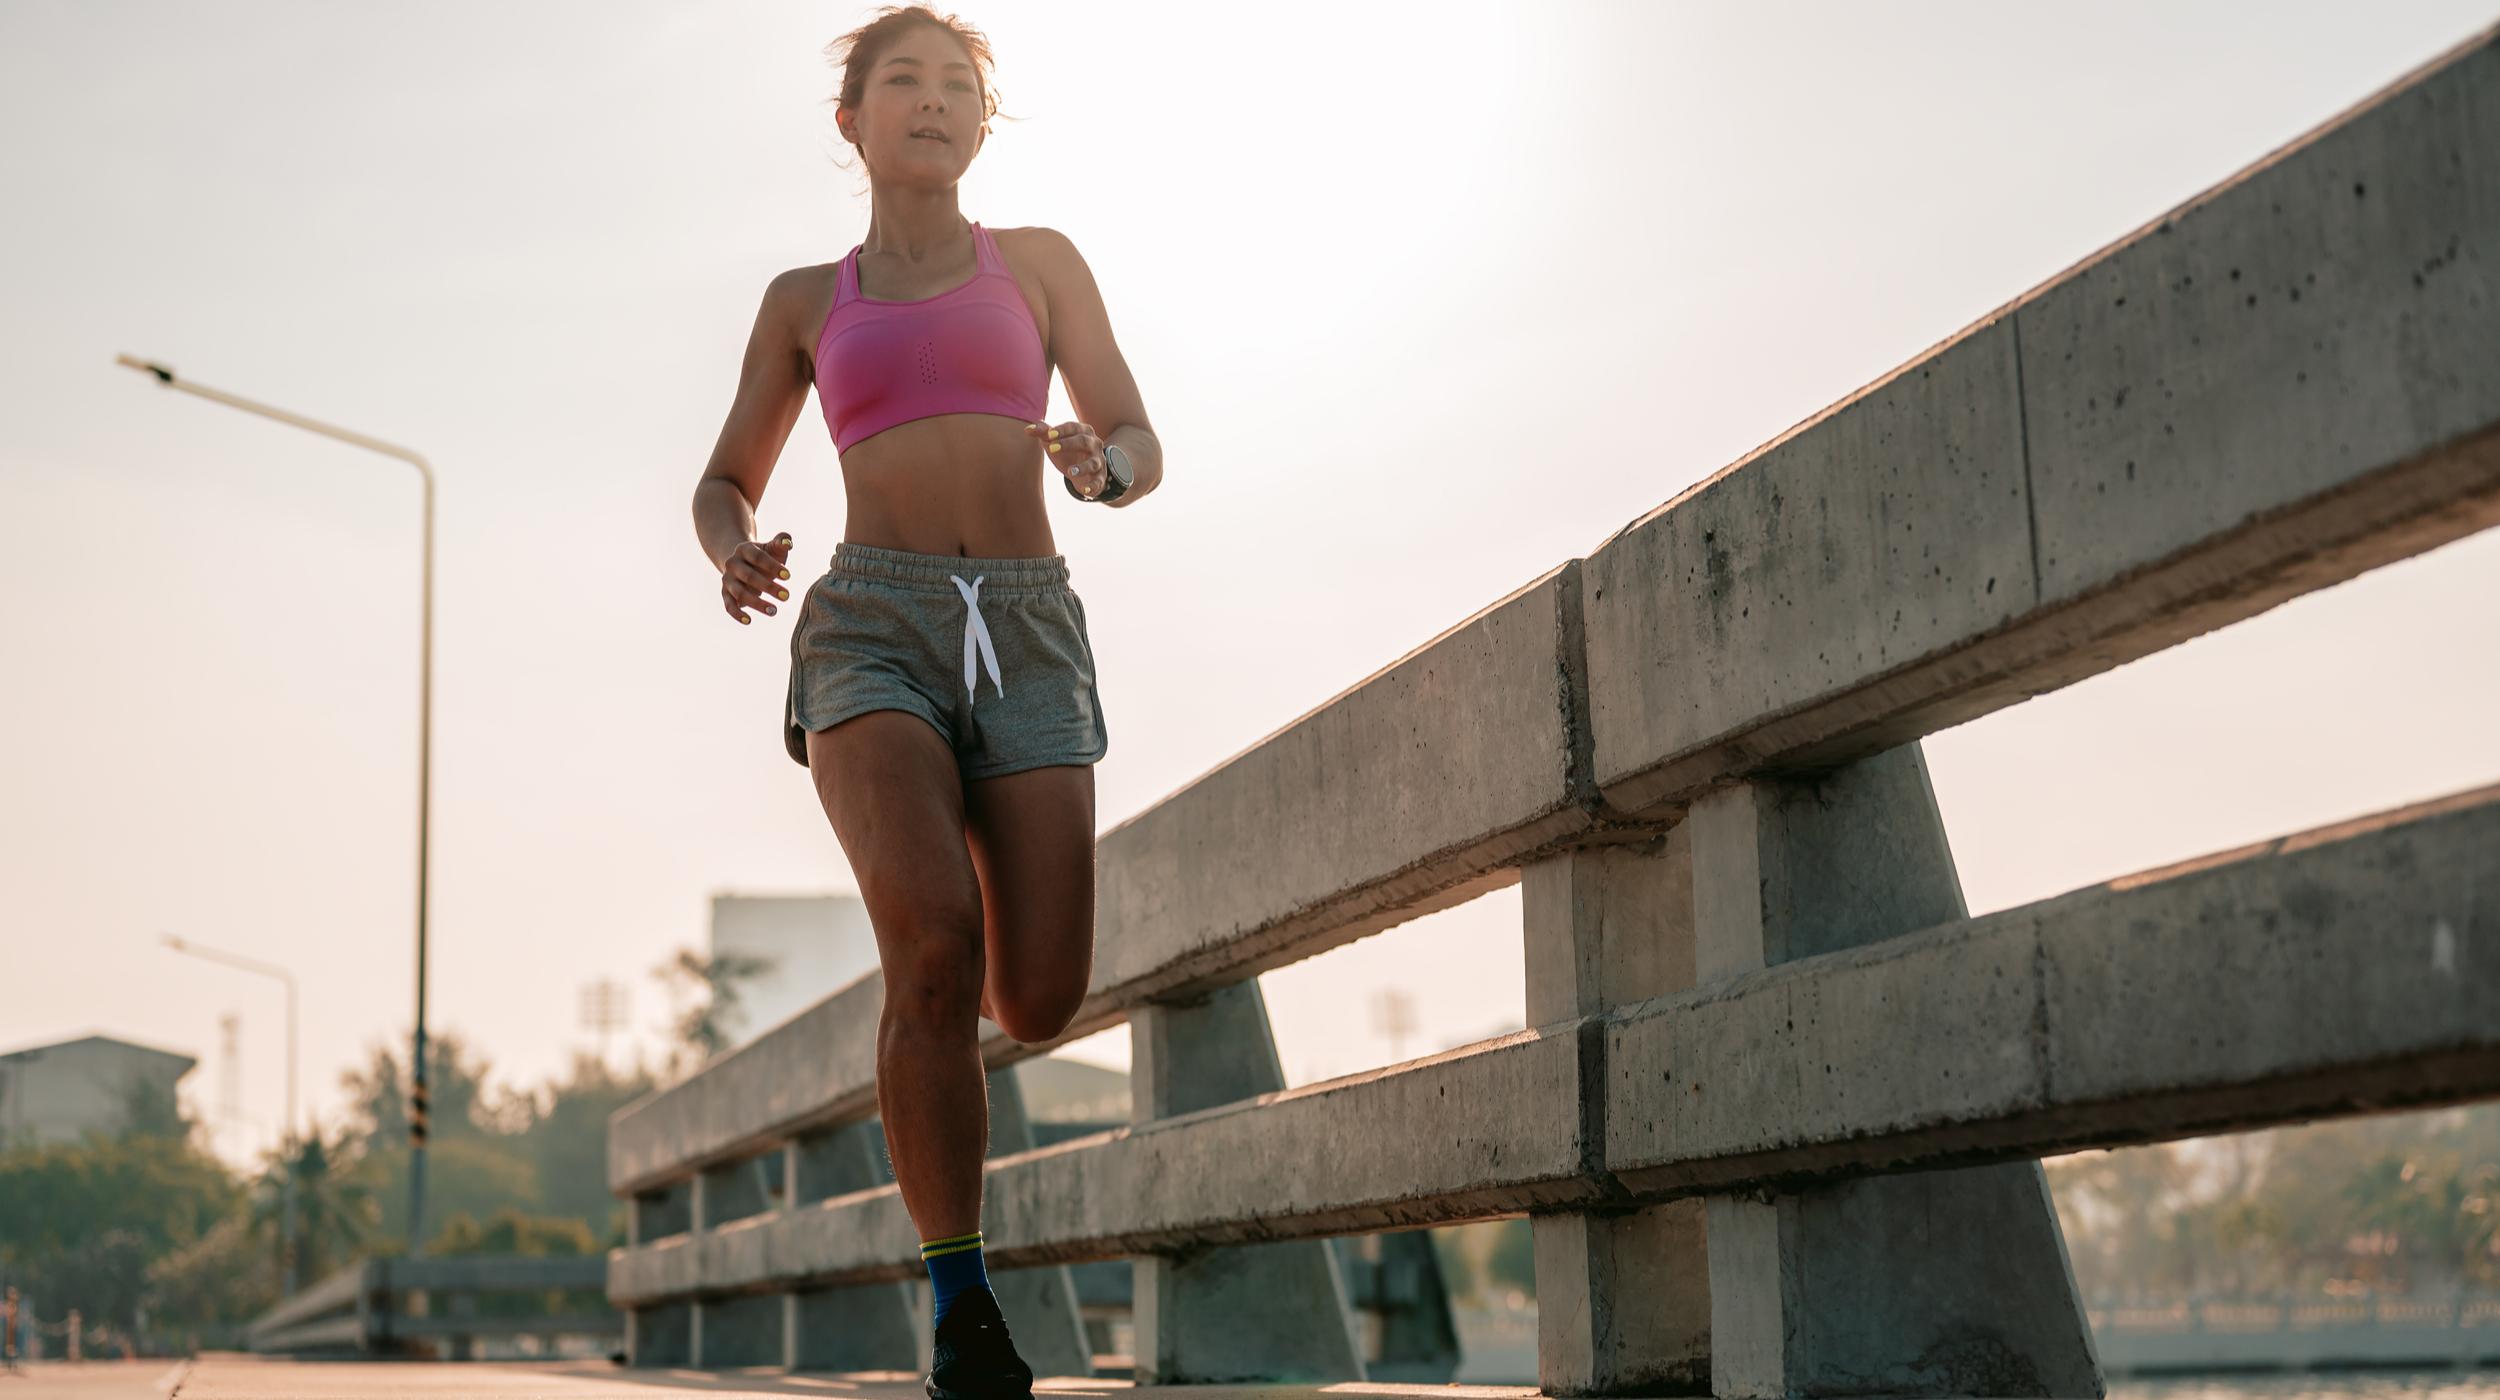 When is Cardio a Good Idea?